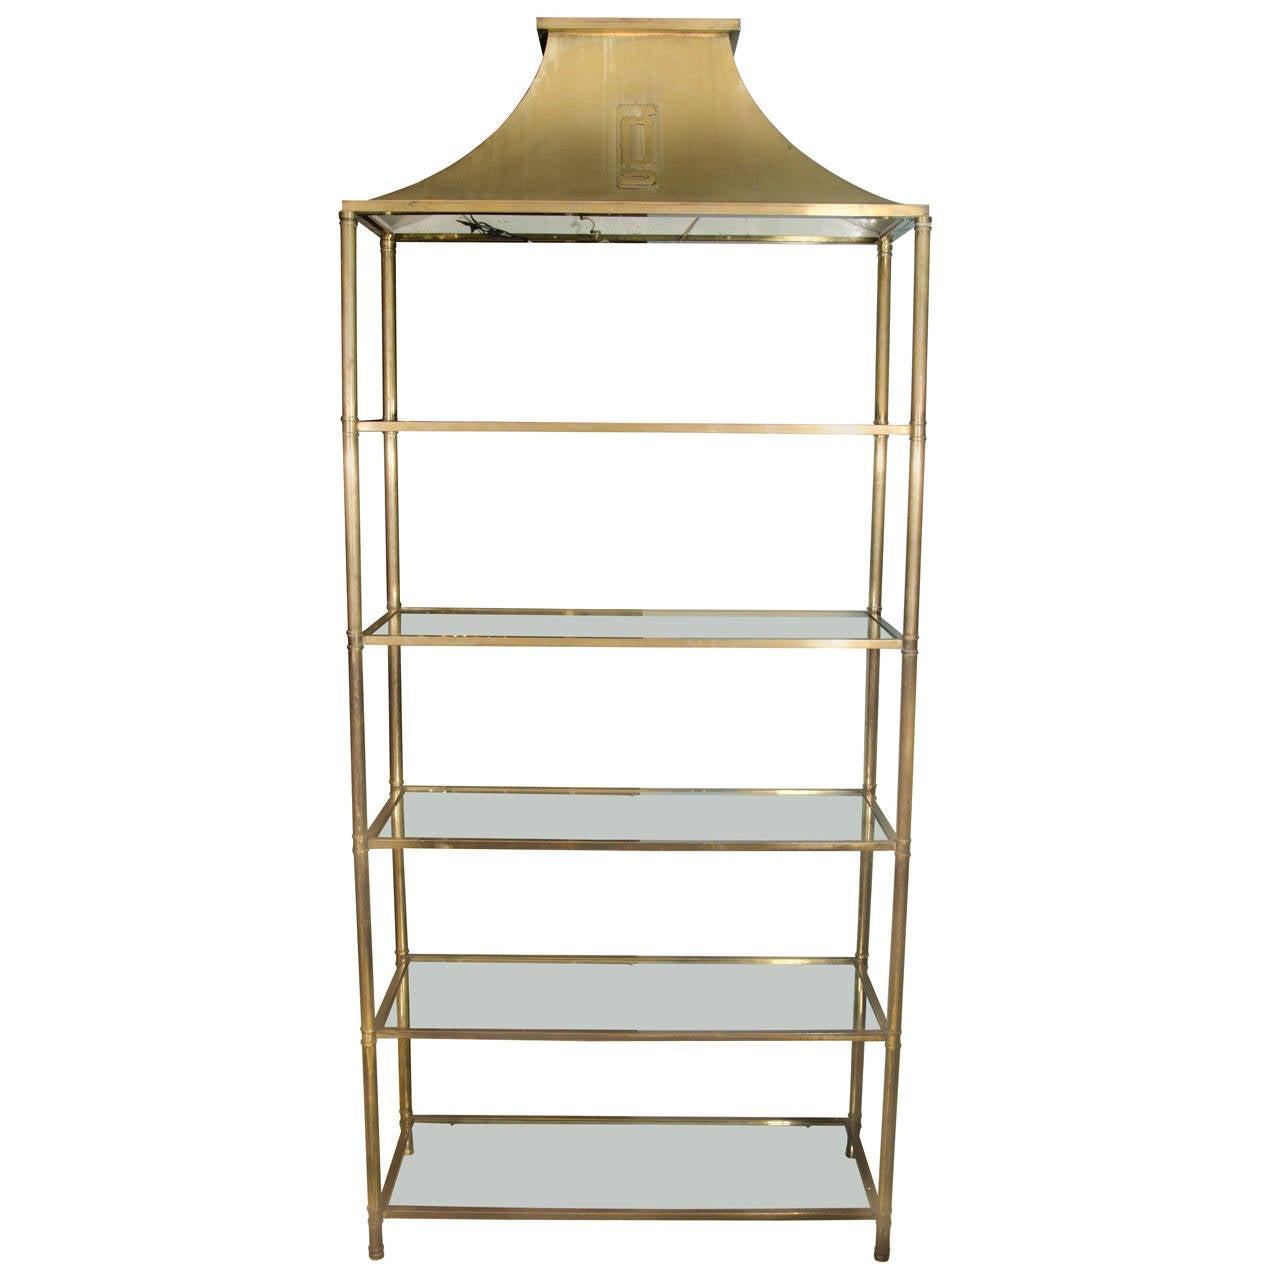 brass pagoda form tager circa 1960s for sale at 1stdibs. Black Bedroom Furniture Sets. Home Design Ideas